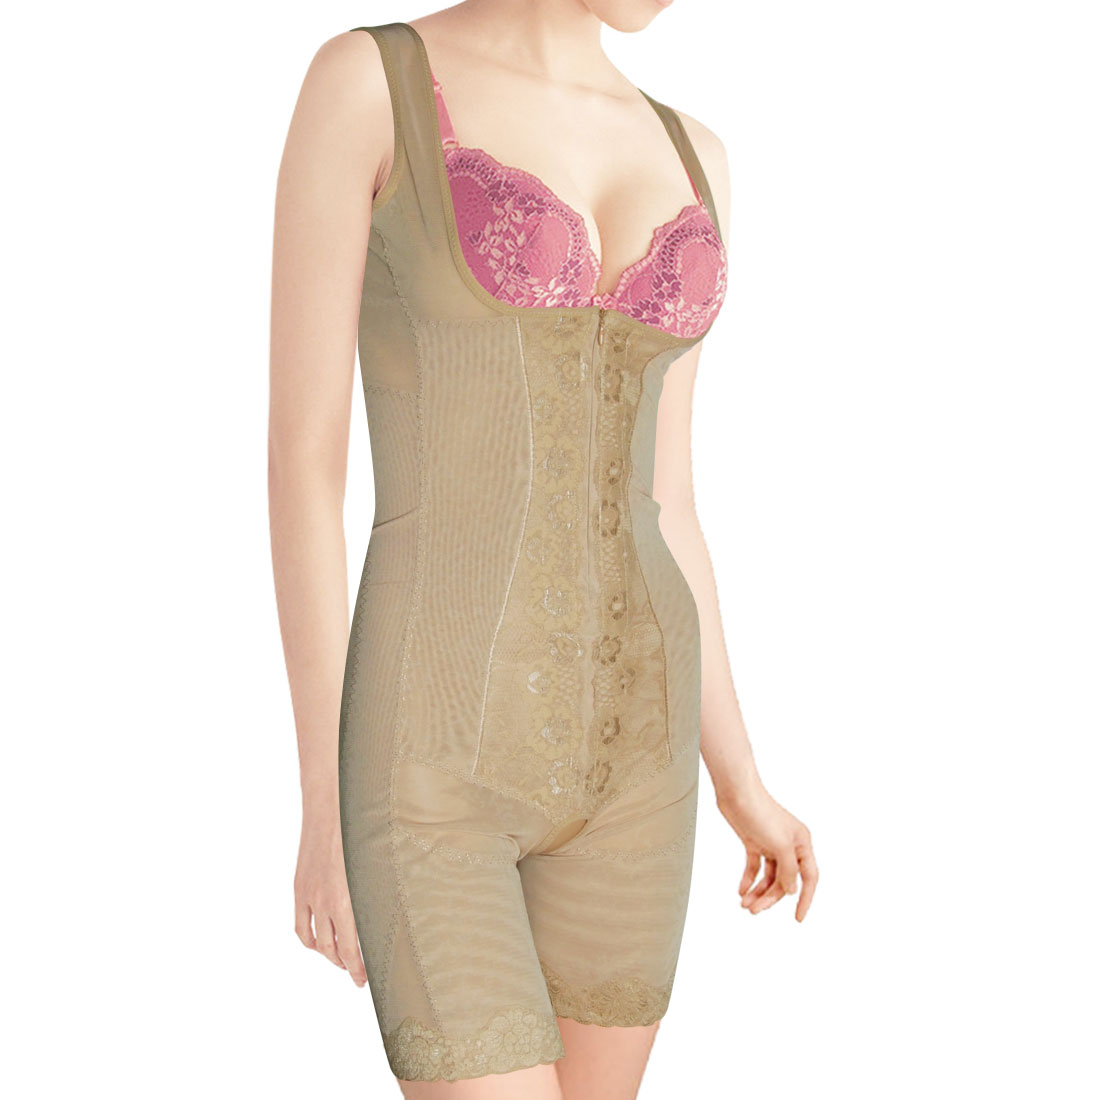 Ladies Tummy Waist Control Braless Shapewear Body Shaper Beige S